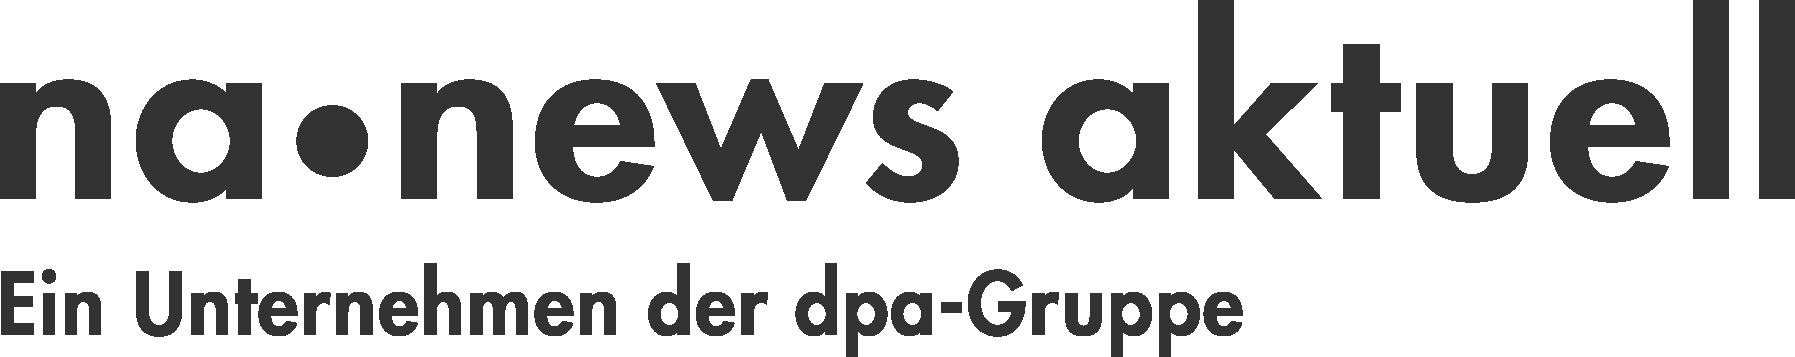 News Aktuell logo